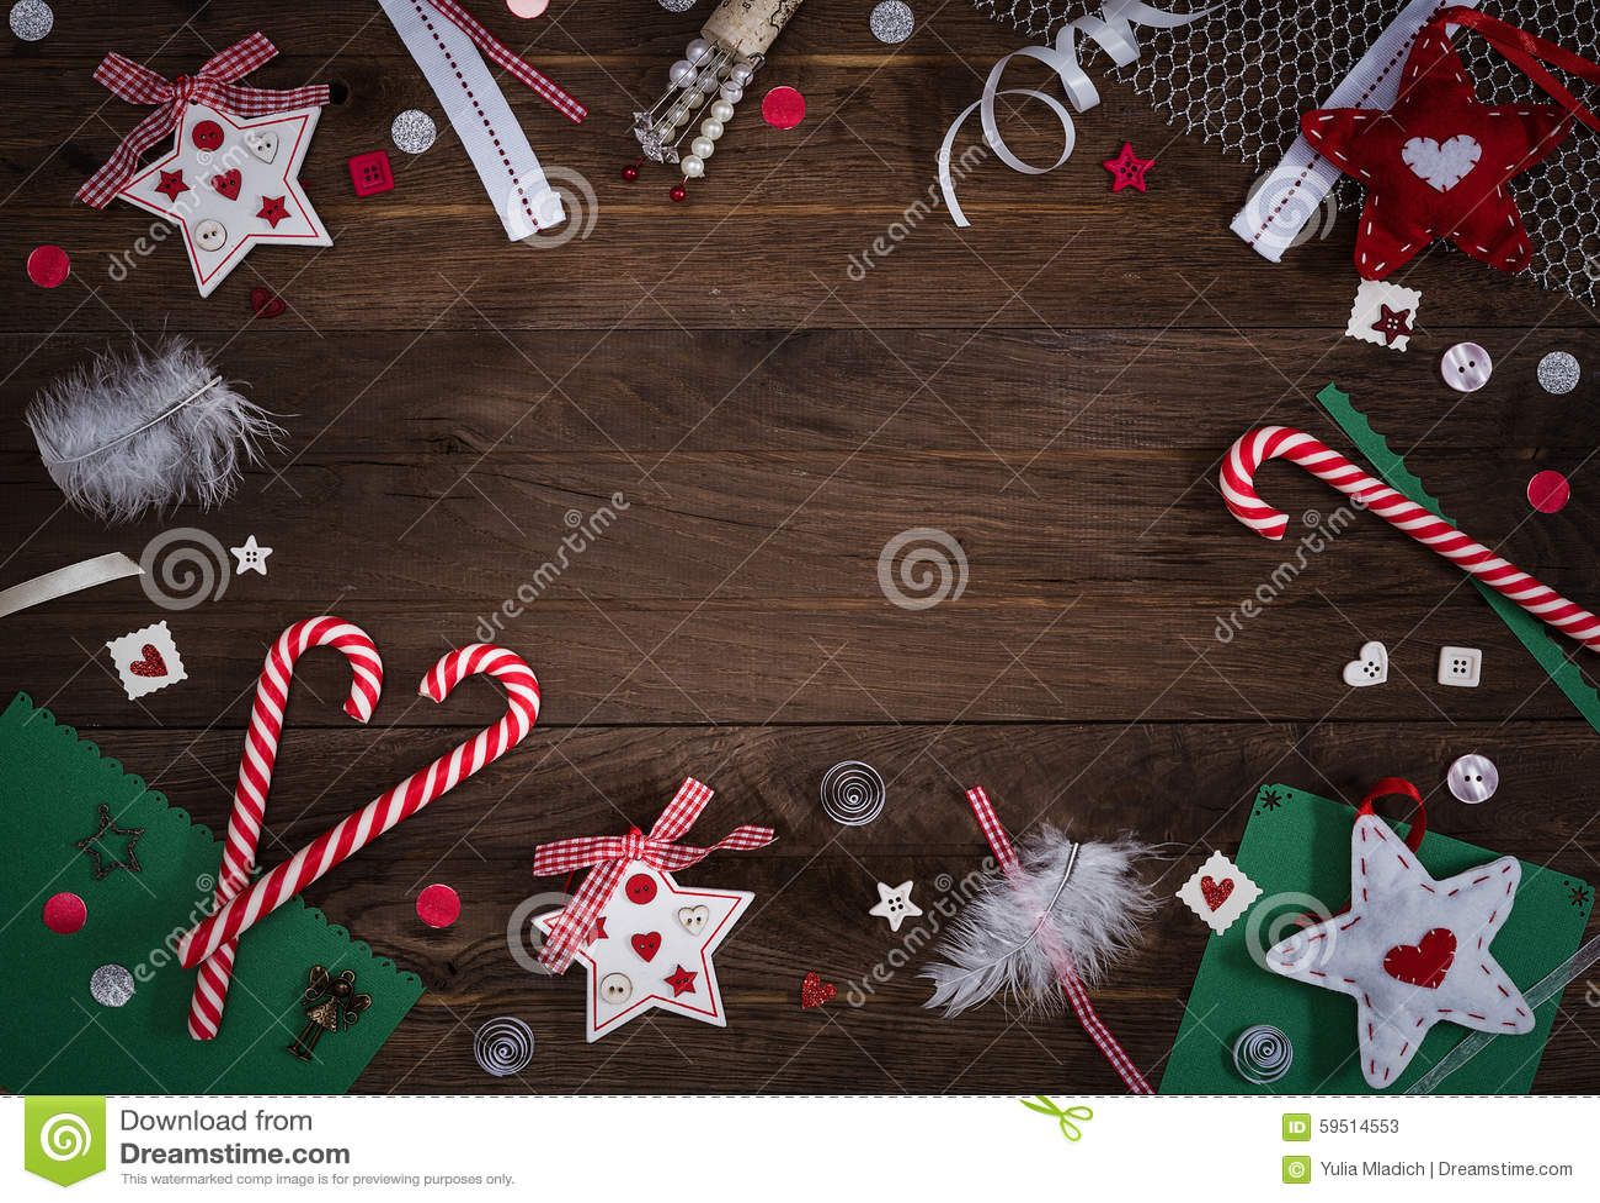 Paper Stars For Christmas